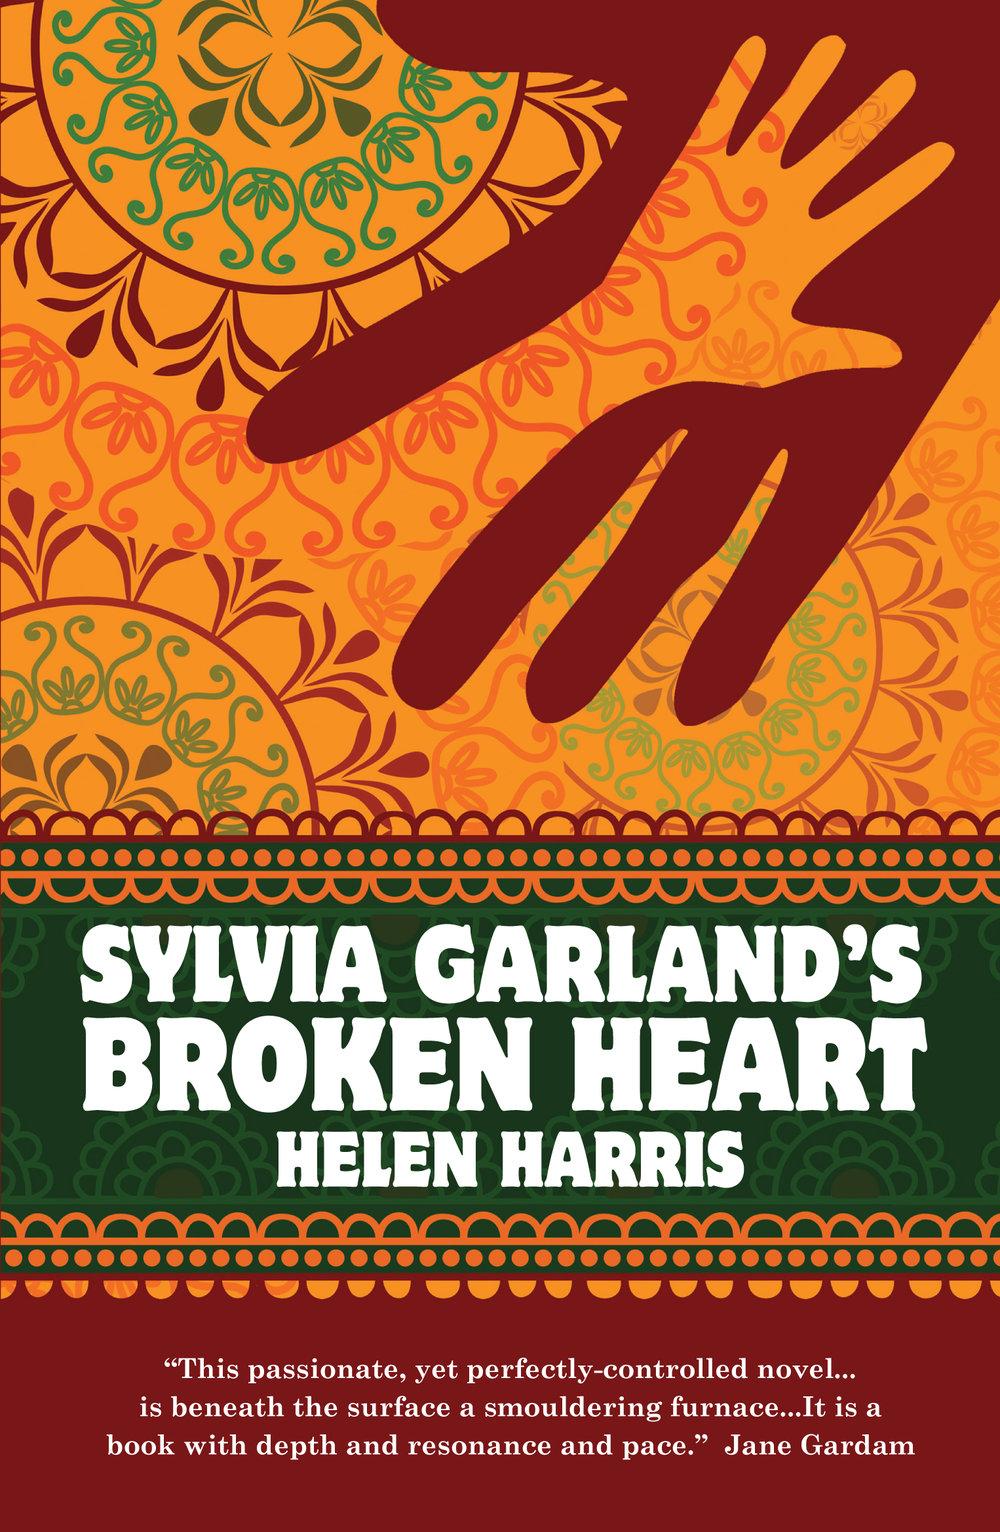 Sylvia Garland's Broken Heart - front image.jpg